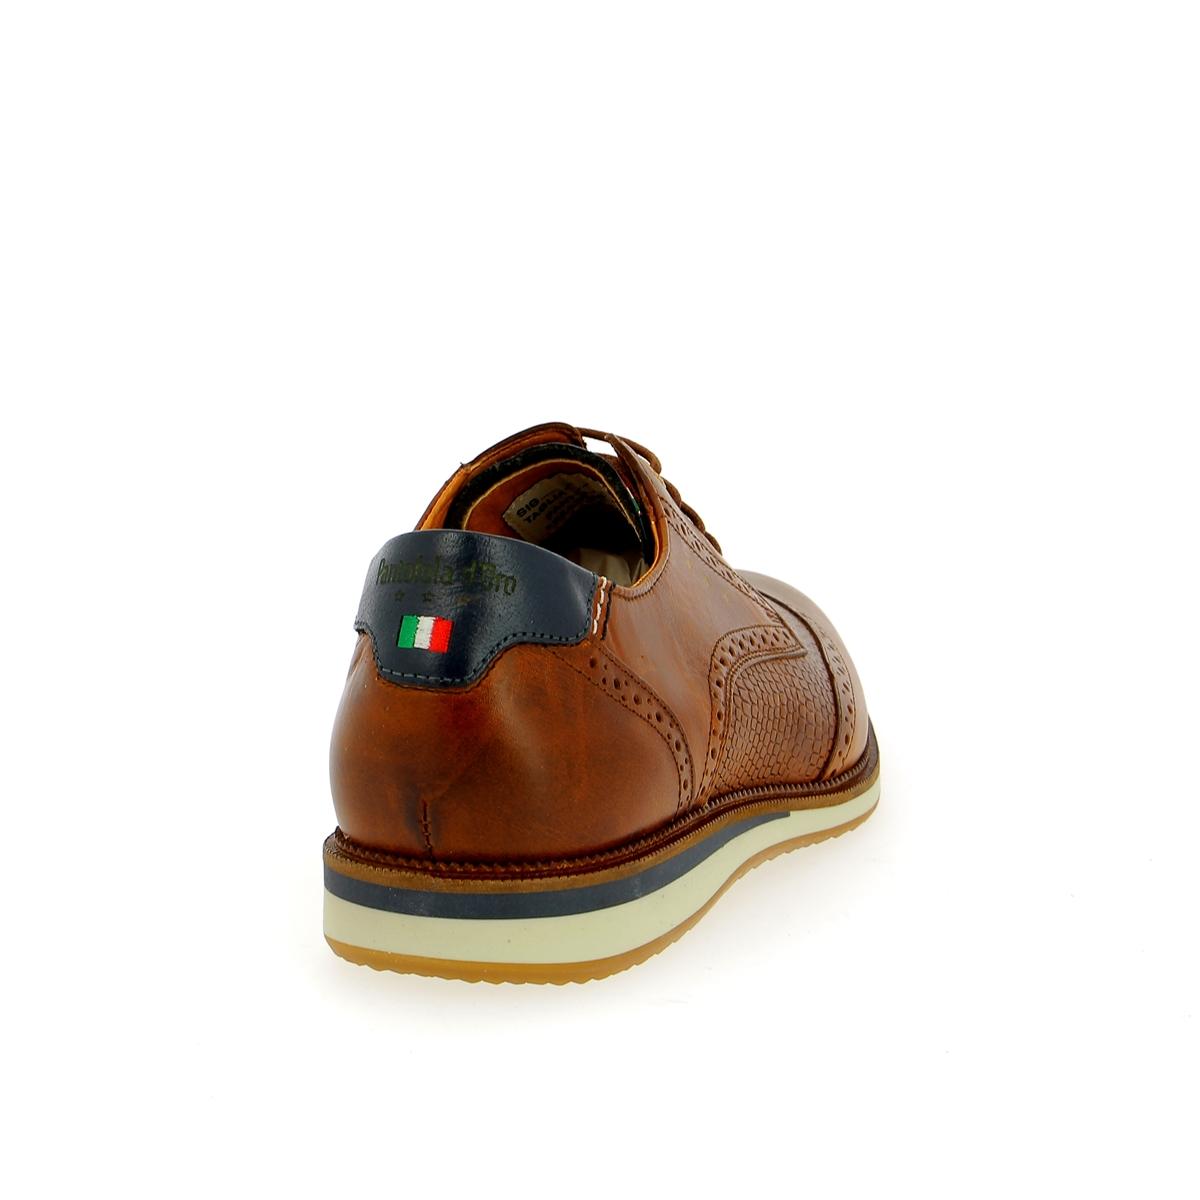 Pantofola D'oro Molières cognac